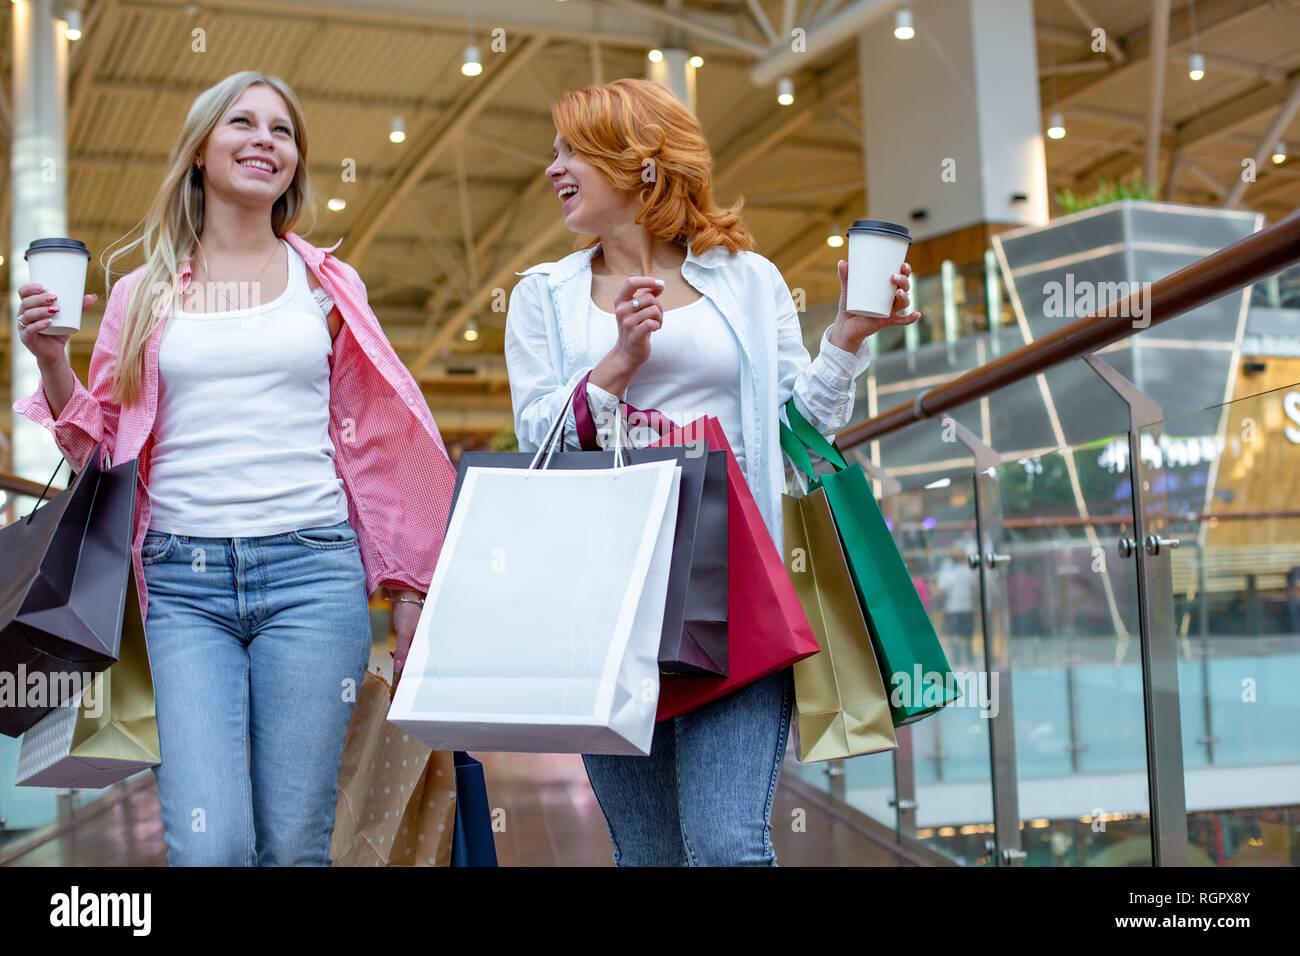 Bag Mall Shopping Stock Photos & Bag Mall Shopping Stock Images